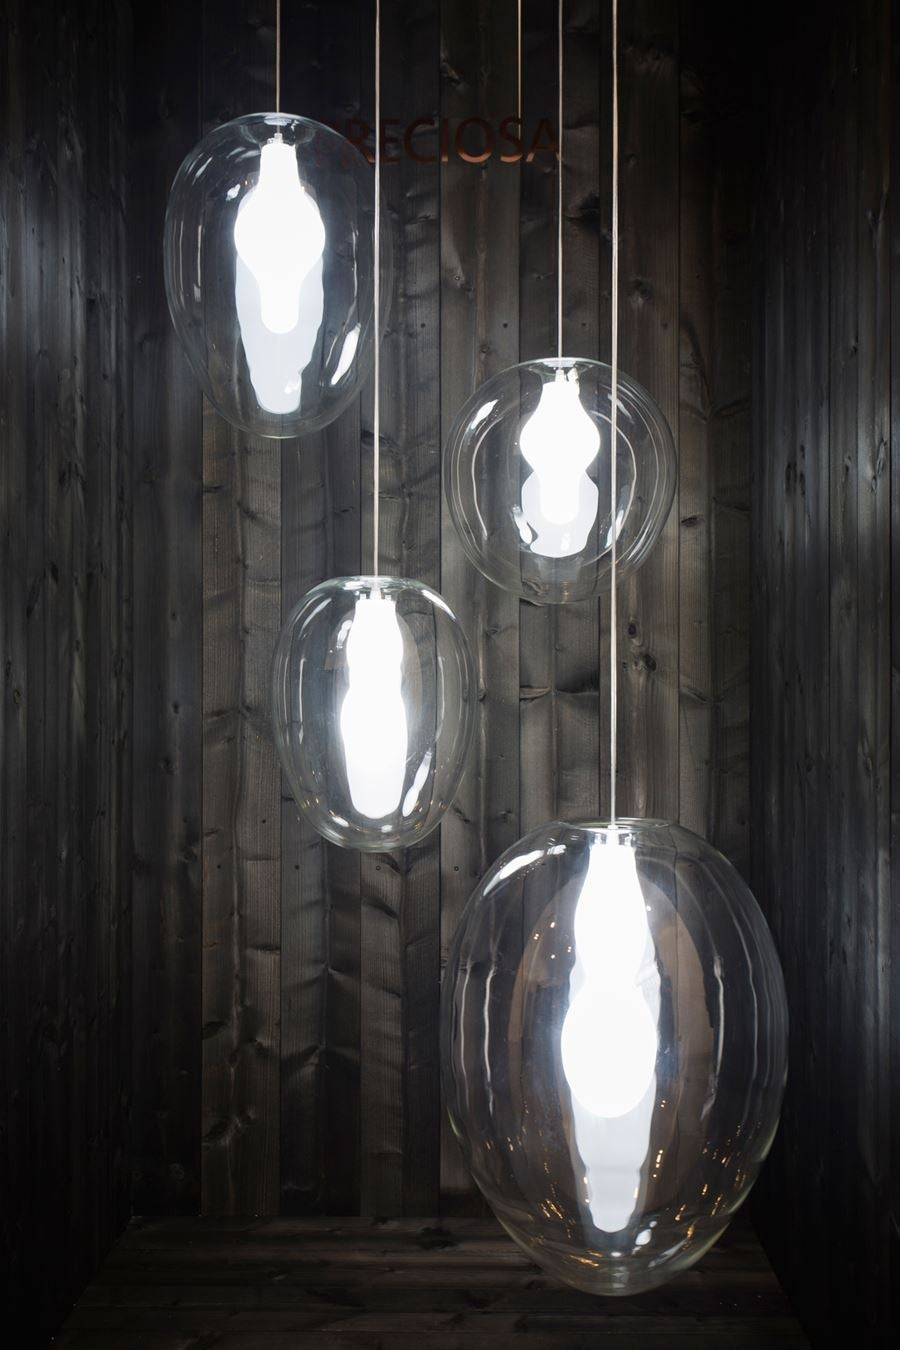 Preciosa soul pendant lights by eva eisler glass mouth blown in preciosa soul pendant lights by eva eisler glass mouth blown in czech republic for sale at 1stdibs aloadofball Image collections